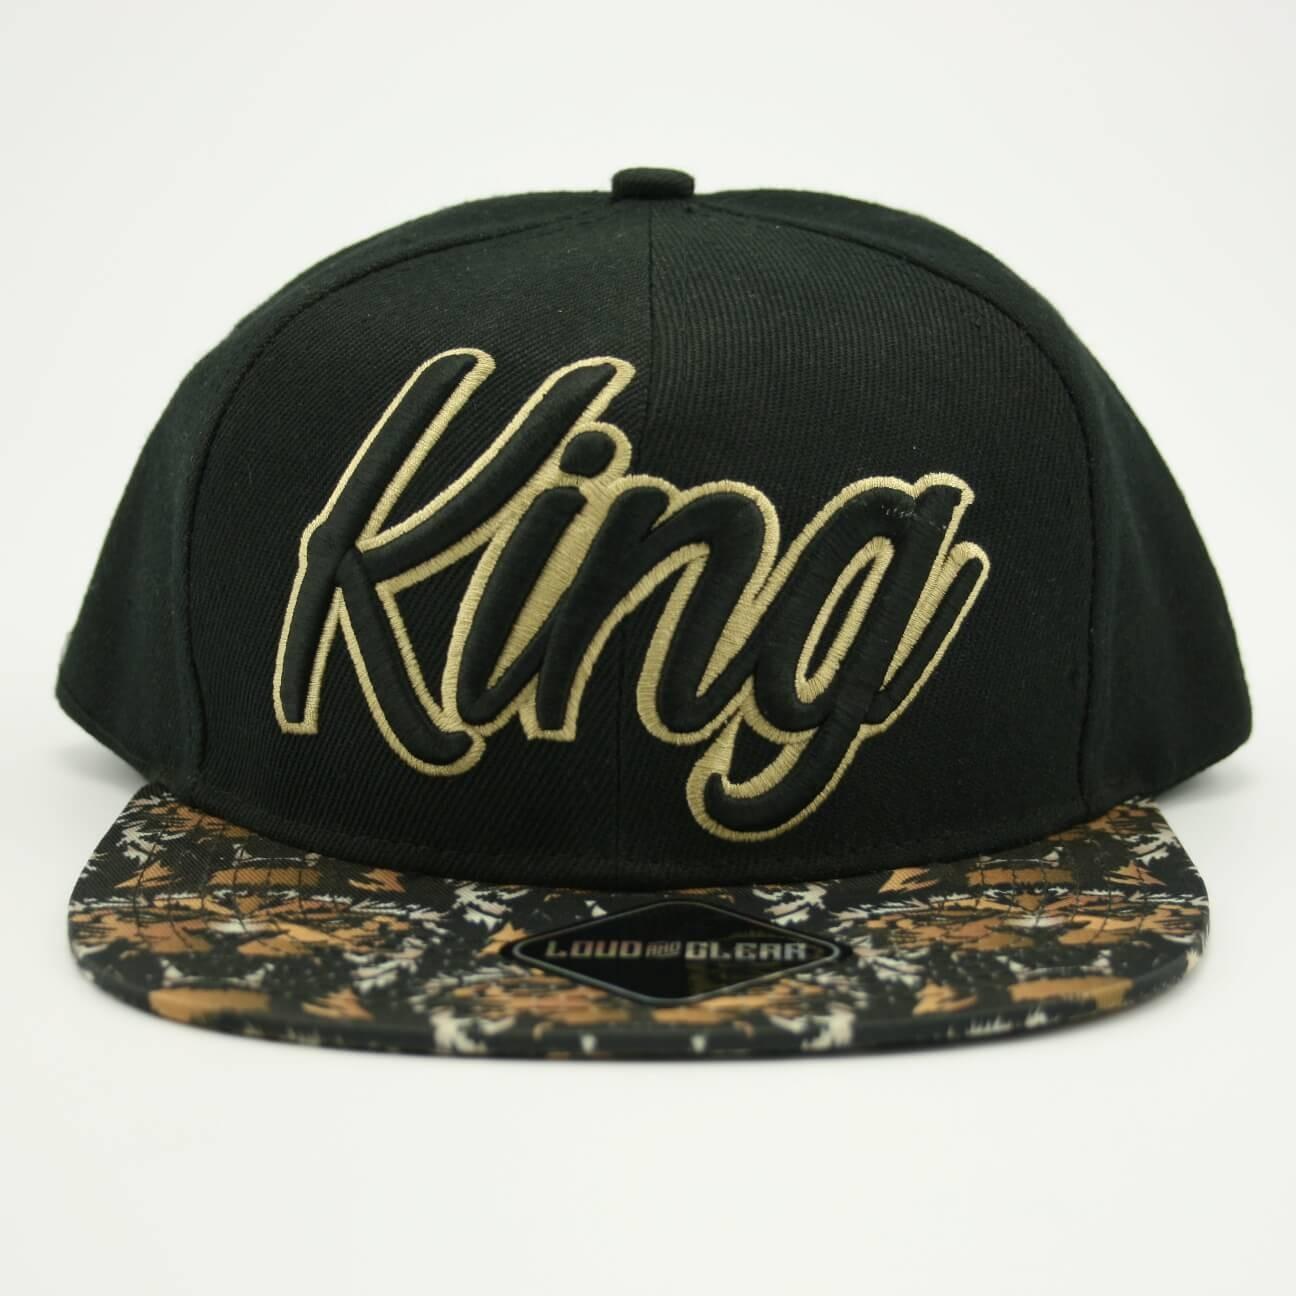 King cap snapback zwart